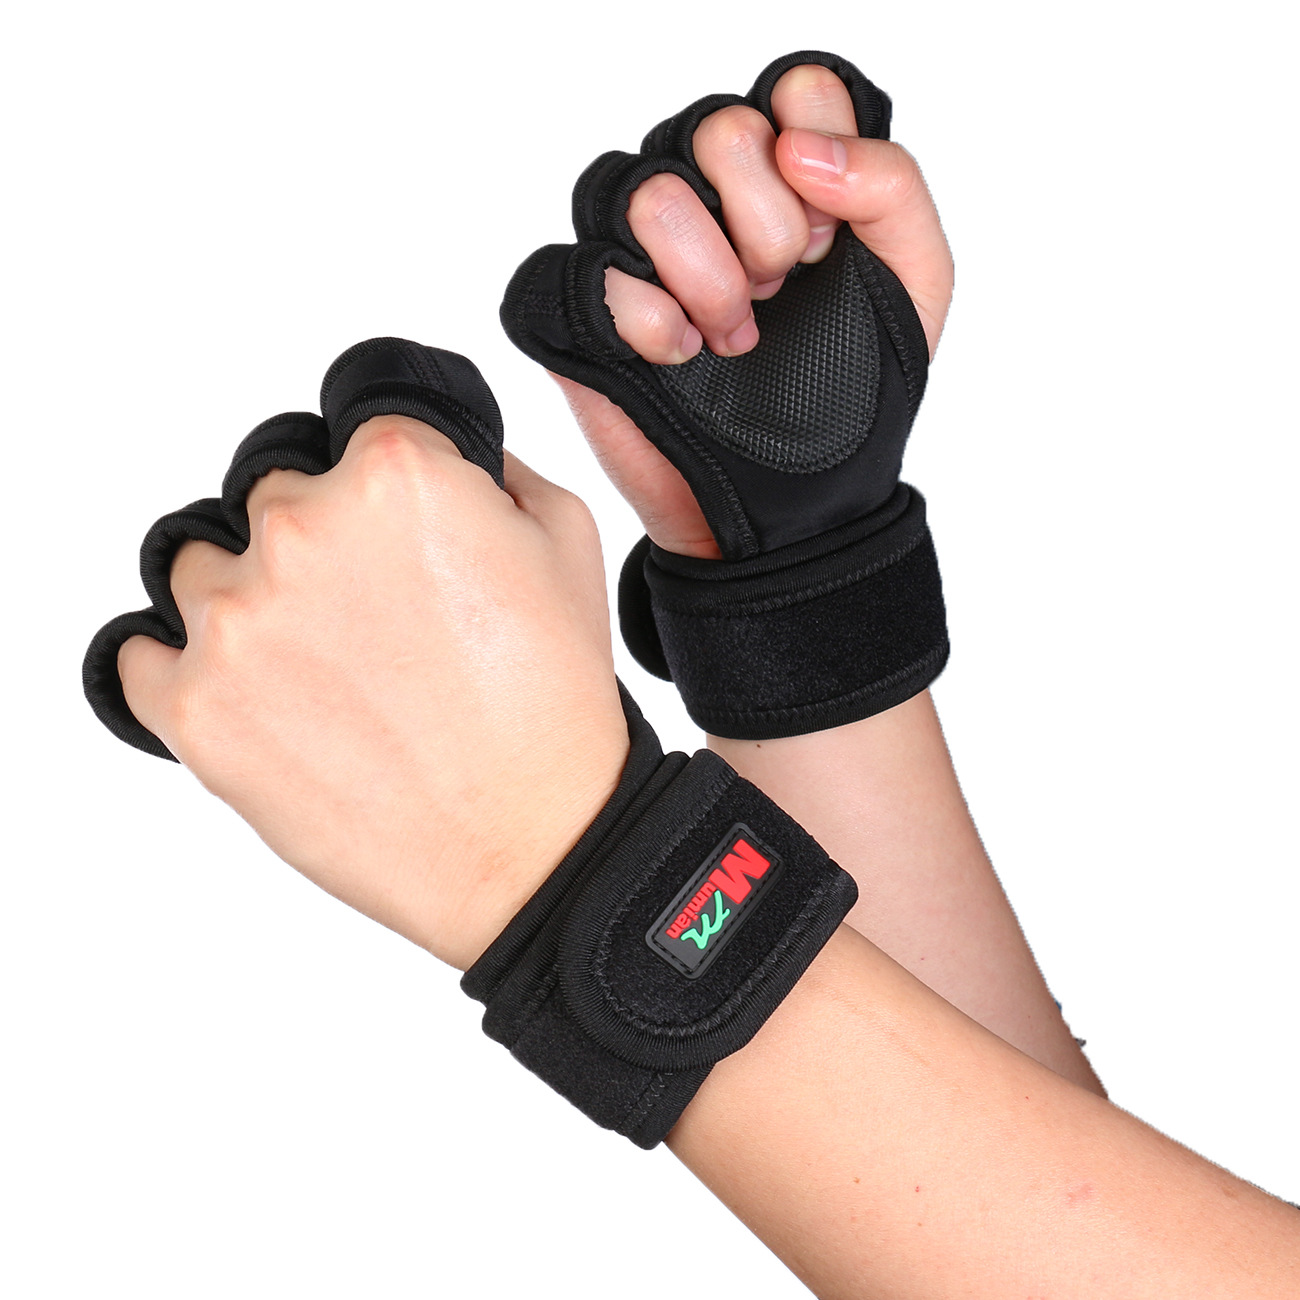 Black Wrist Wrap Hand Brace Support Weight Lifting Gym Sprain Bandage Gloves NEW